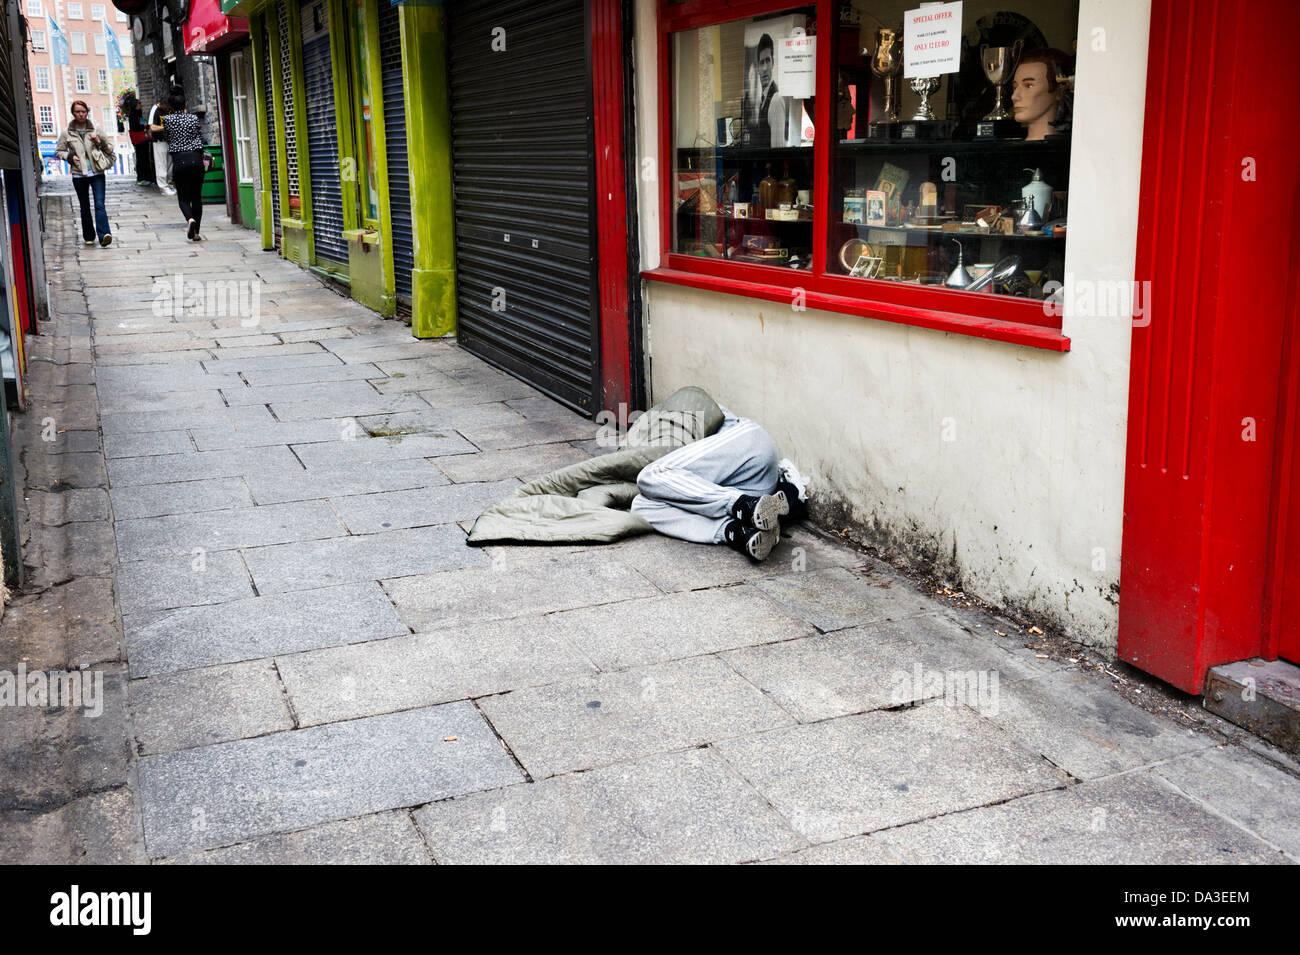 Sleeping rough on the pavement, Dublin City centre, Irish Republic Stock Photo